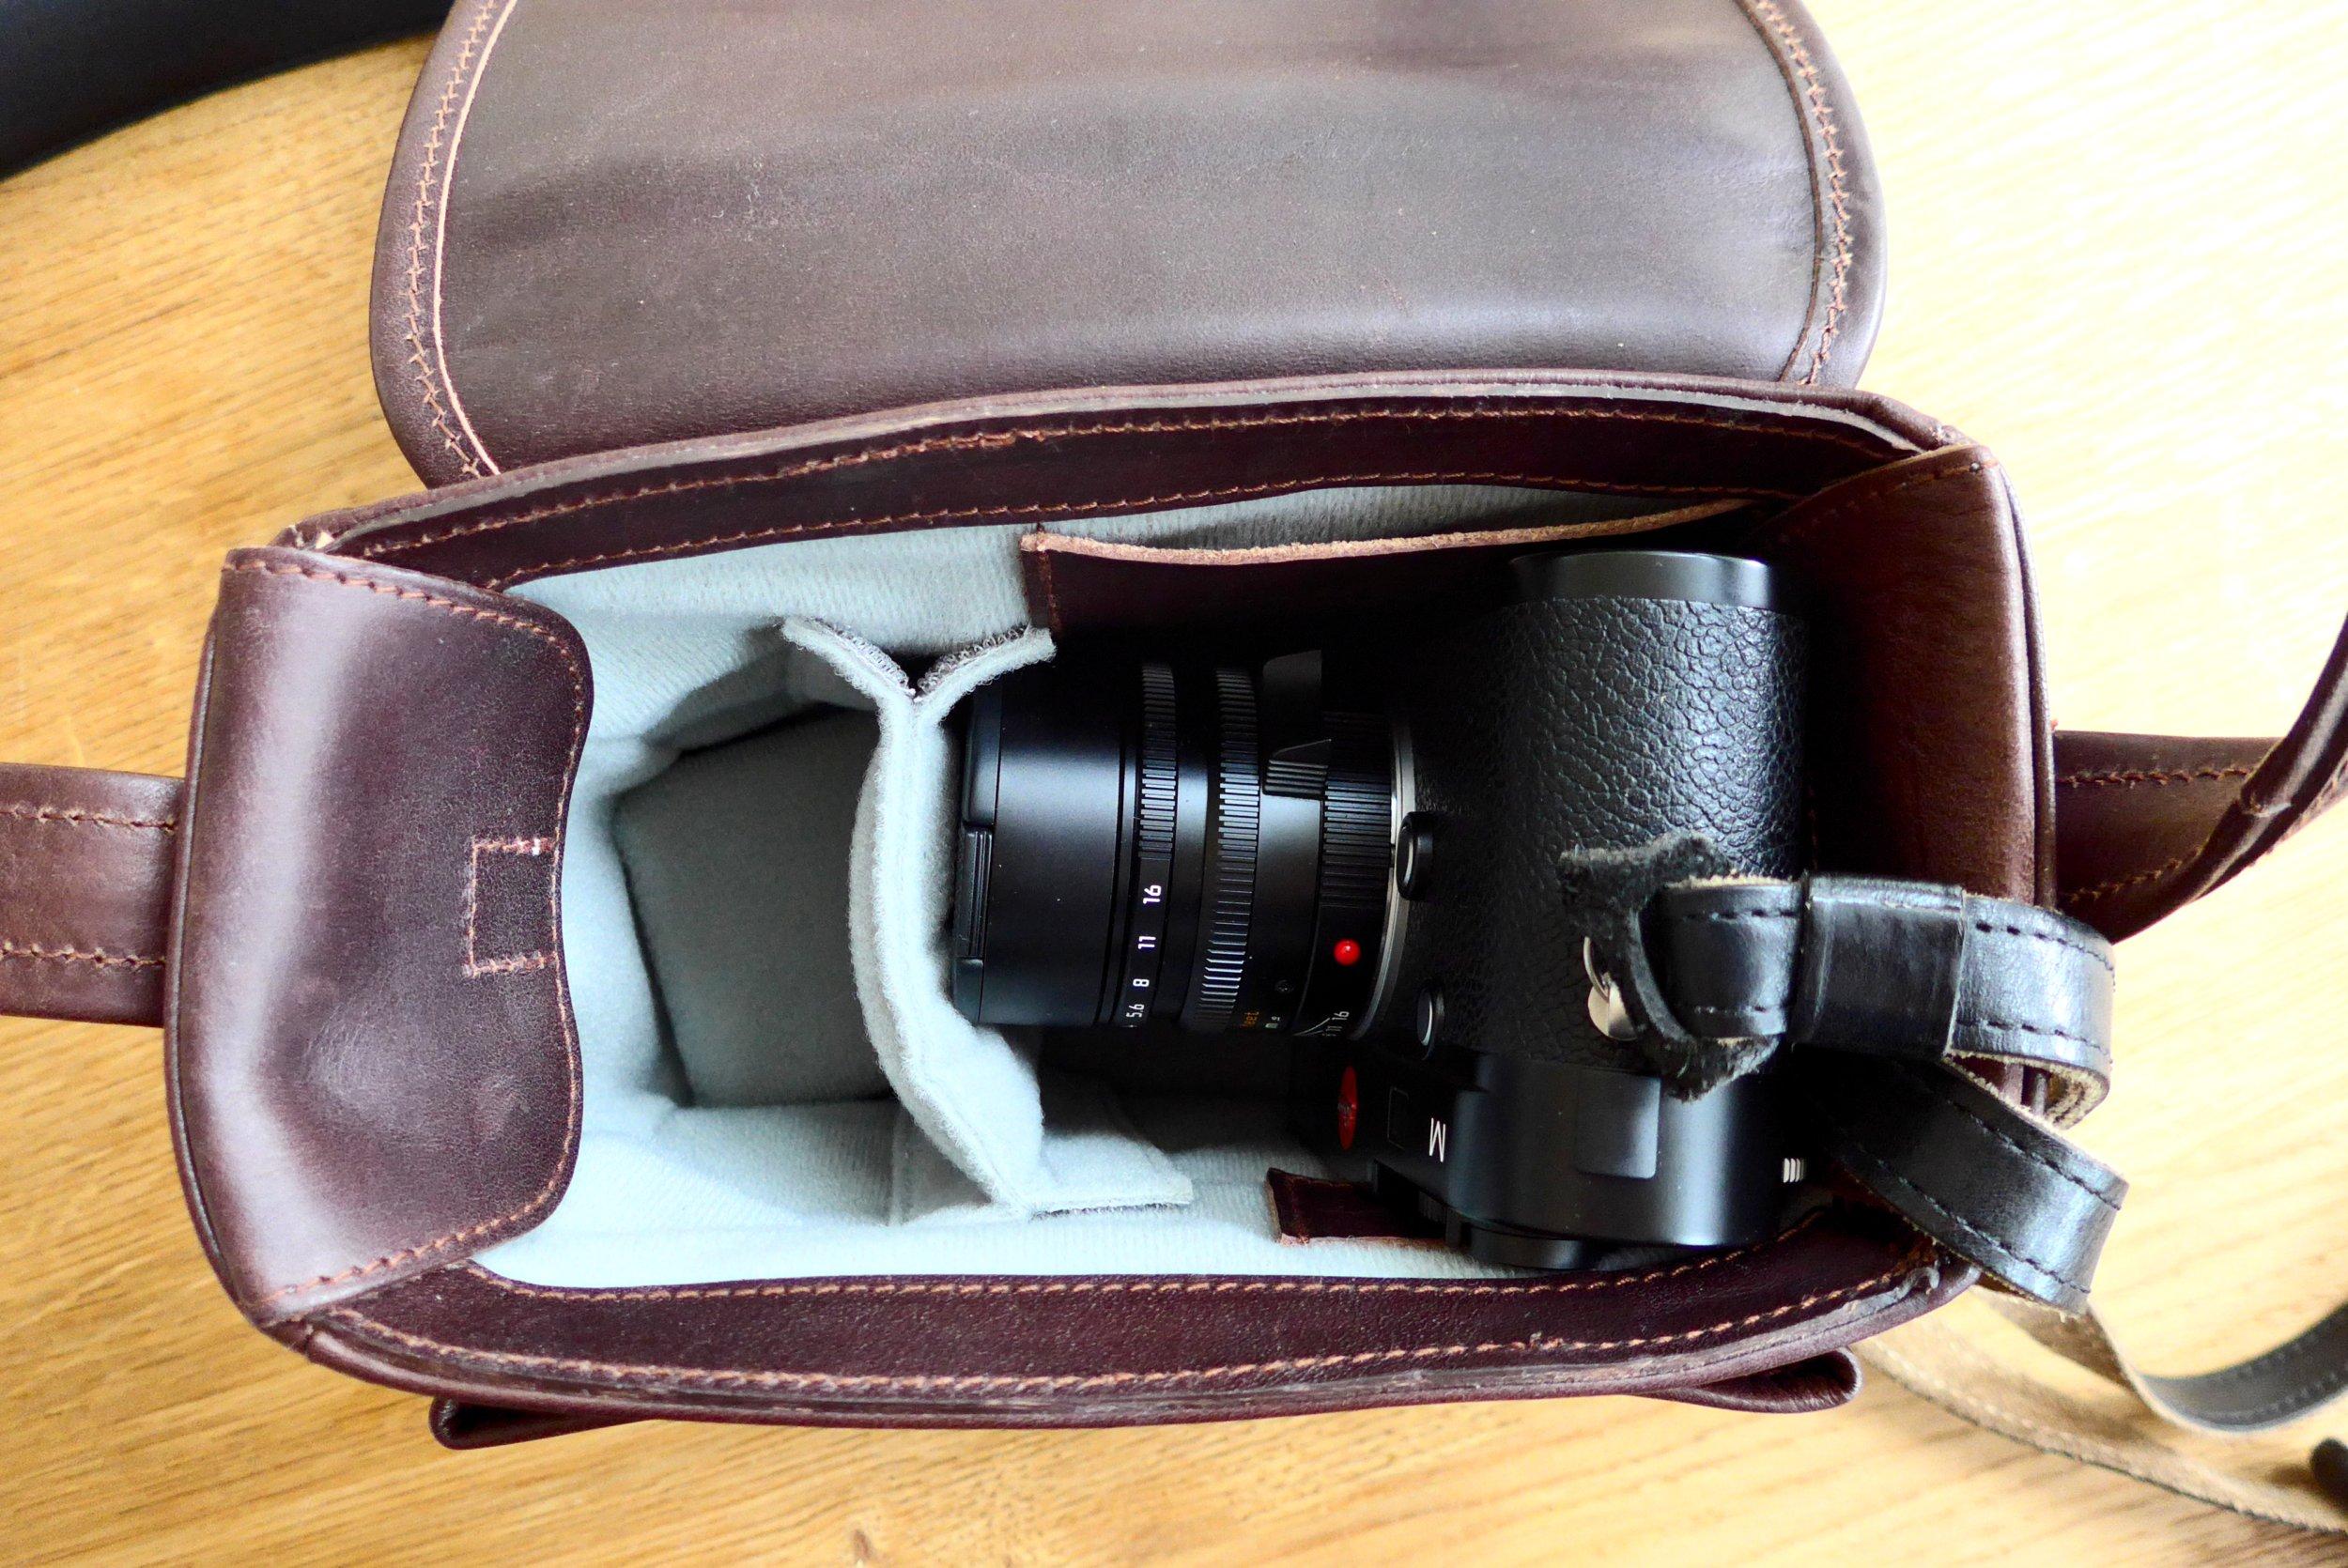 Freie Kamera sitzt